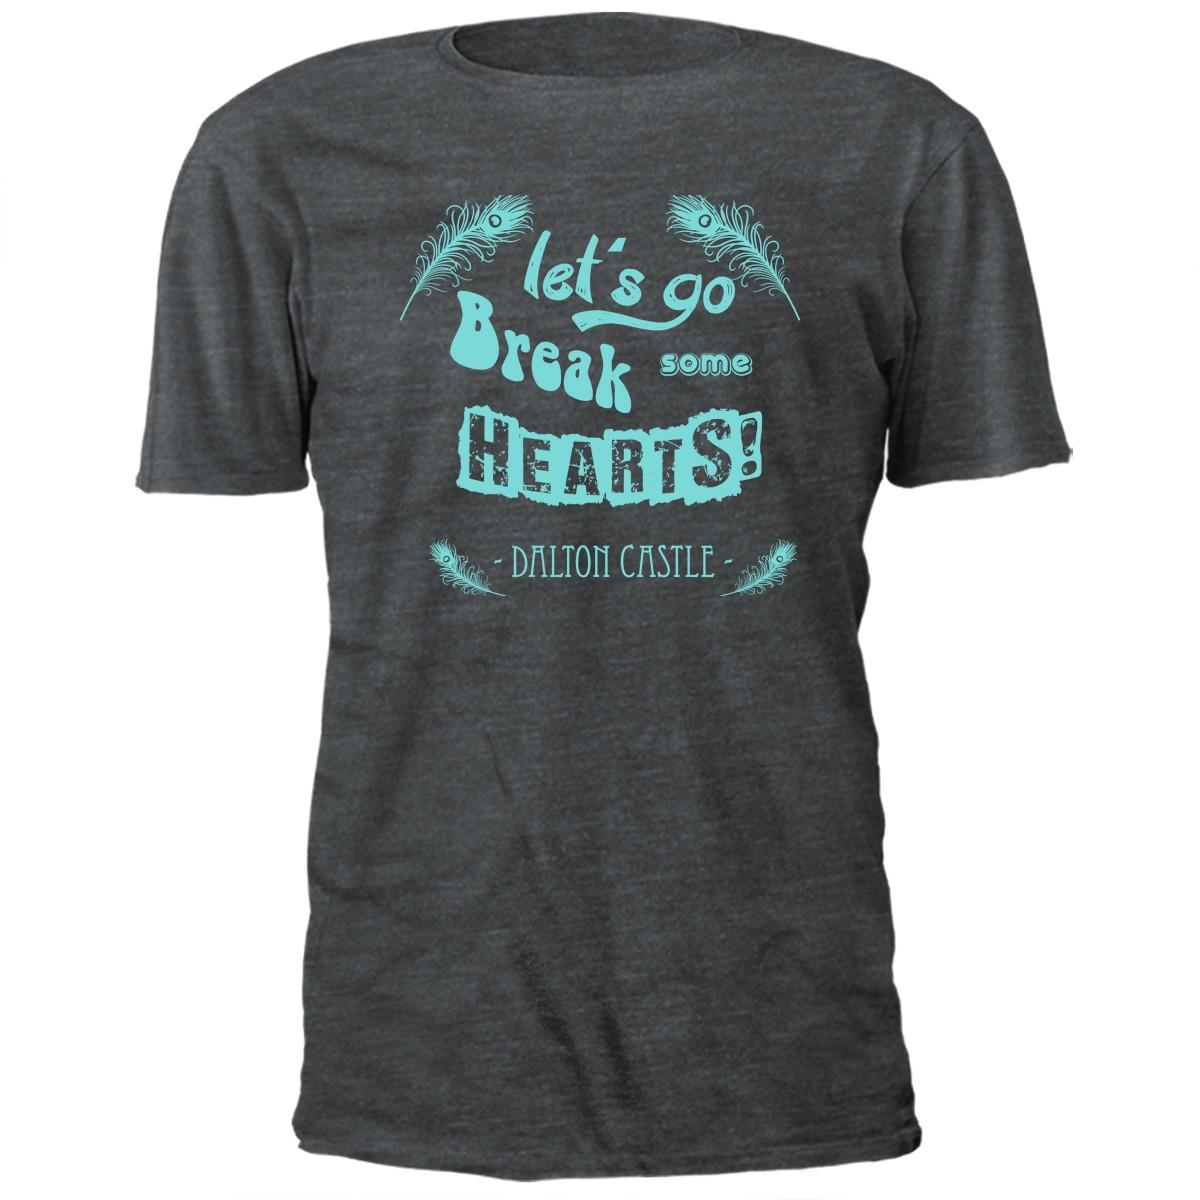 Dalton Castle Break Some Hearts T-shirt